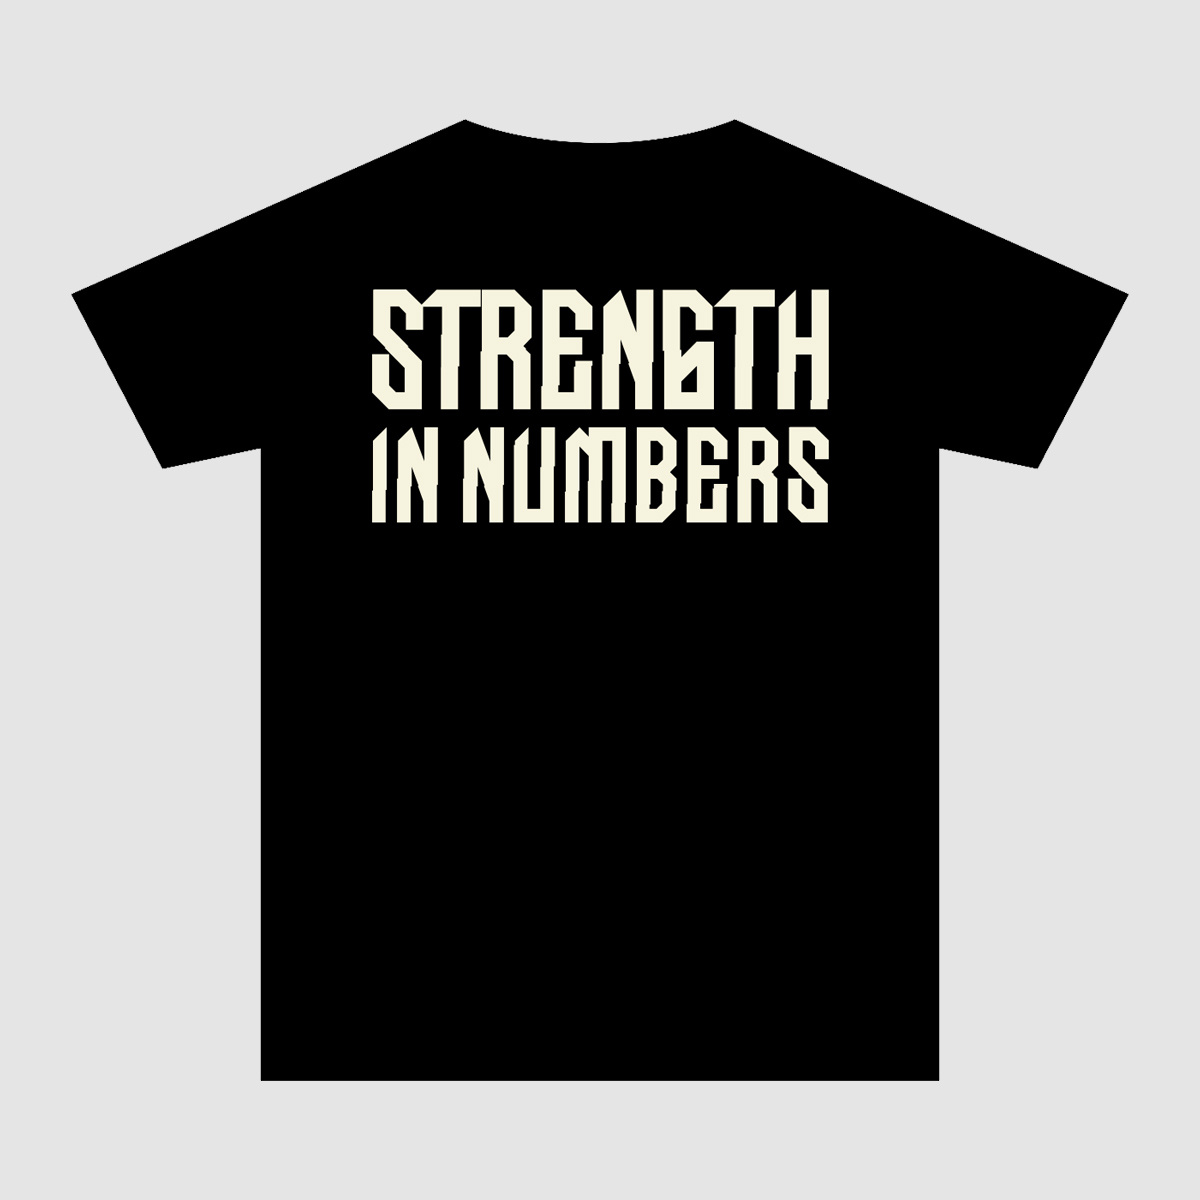 Public Enemies - Strength In Numbers T-shirt